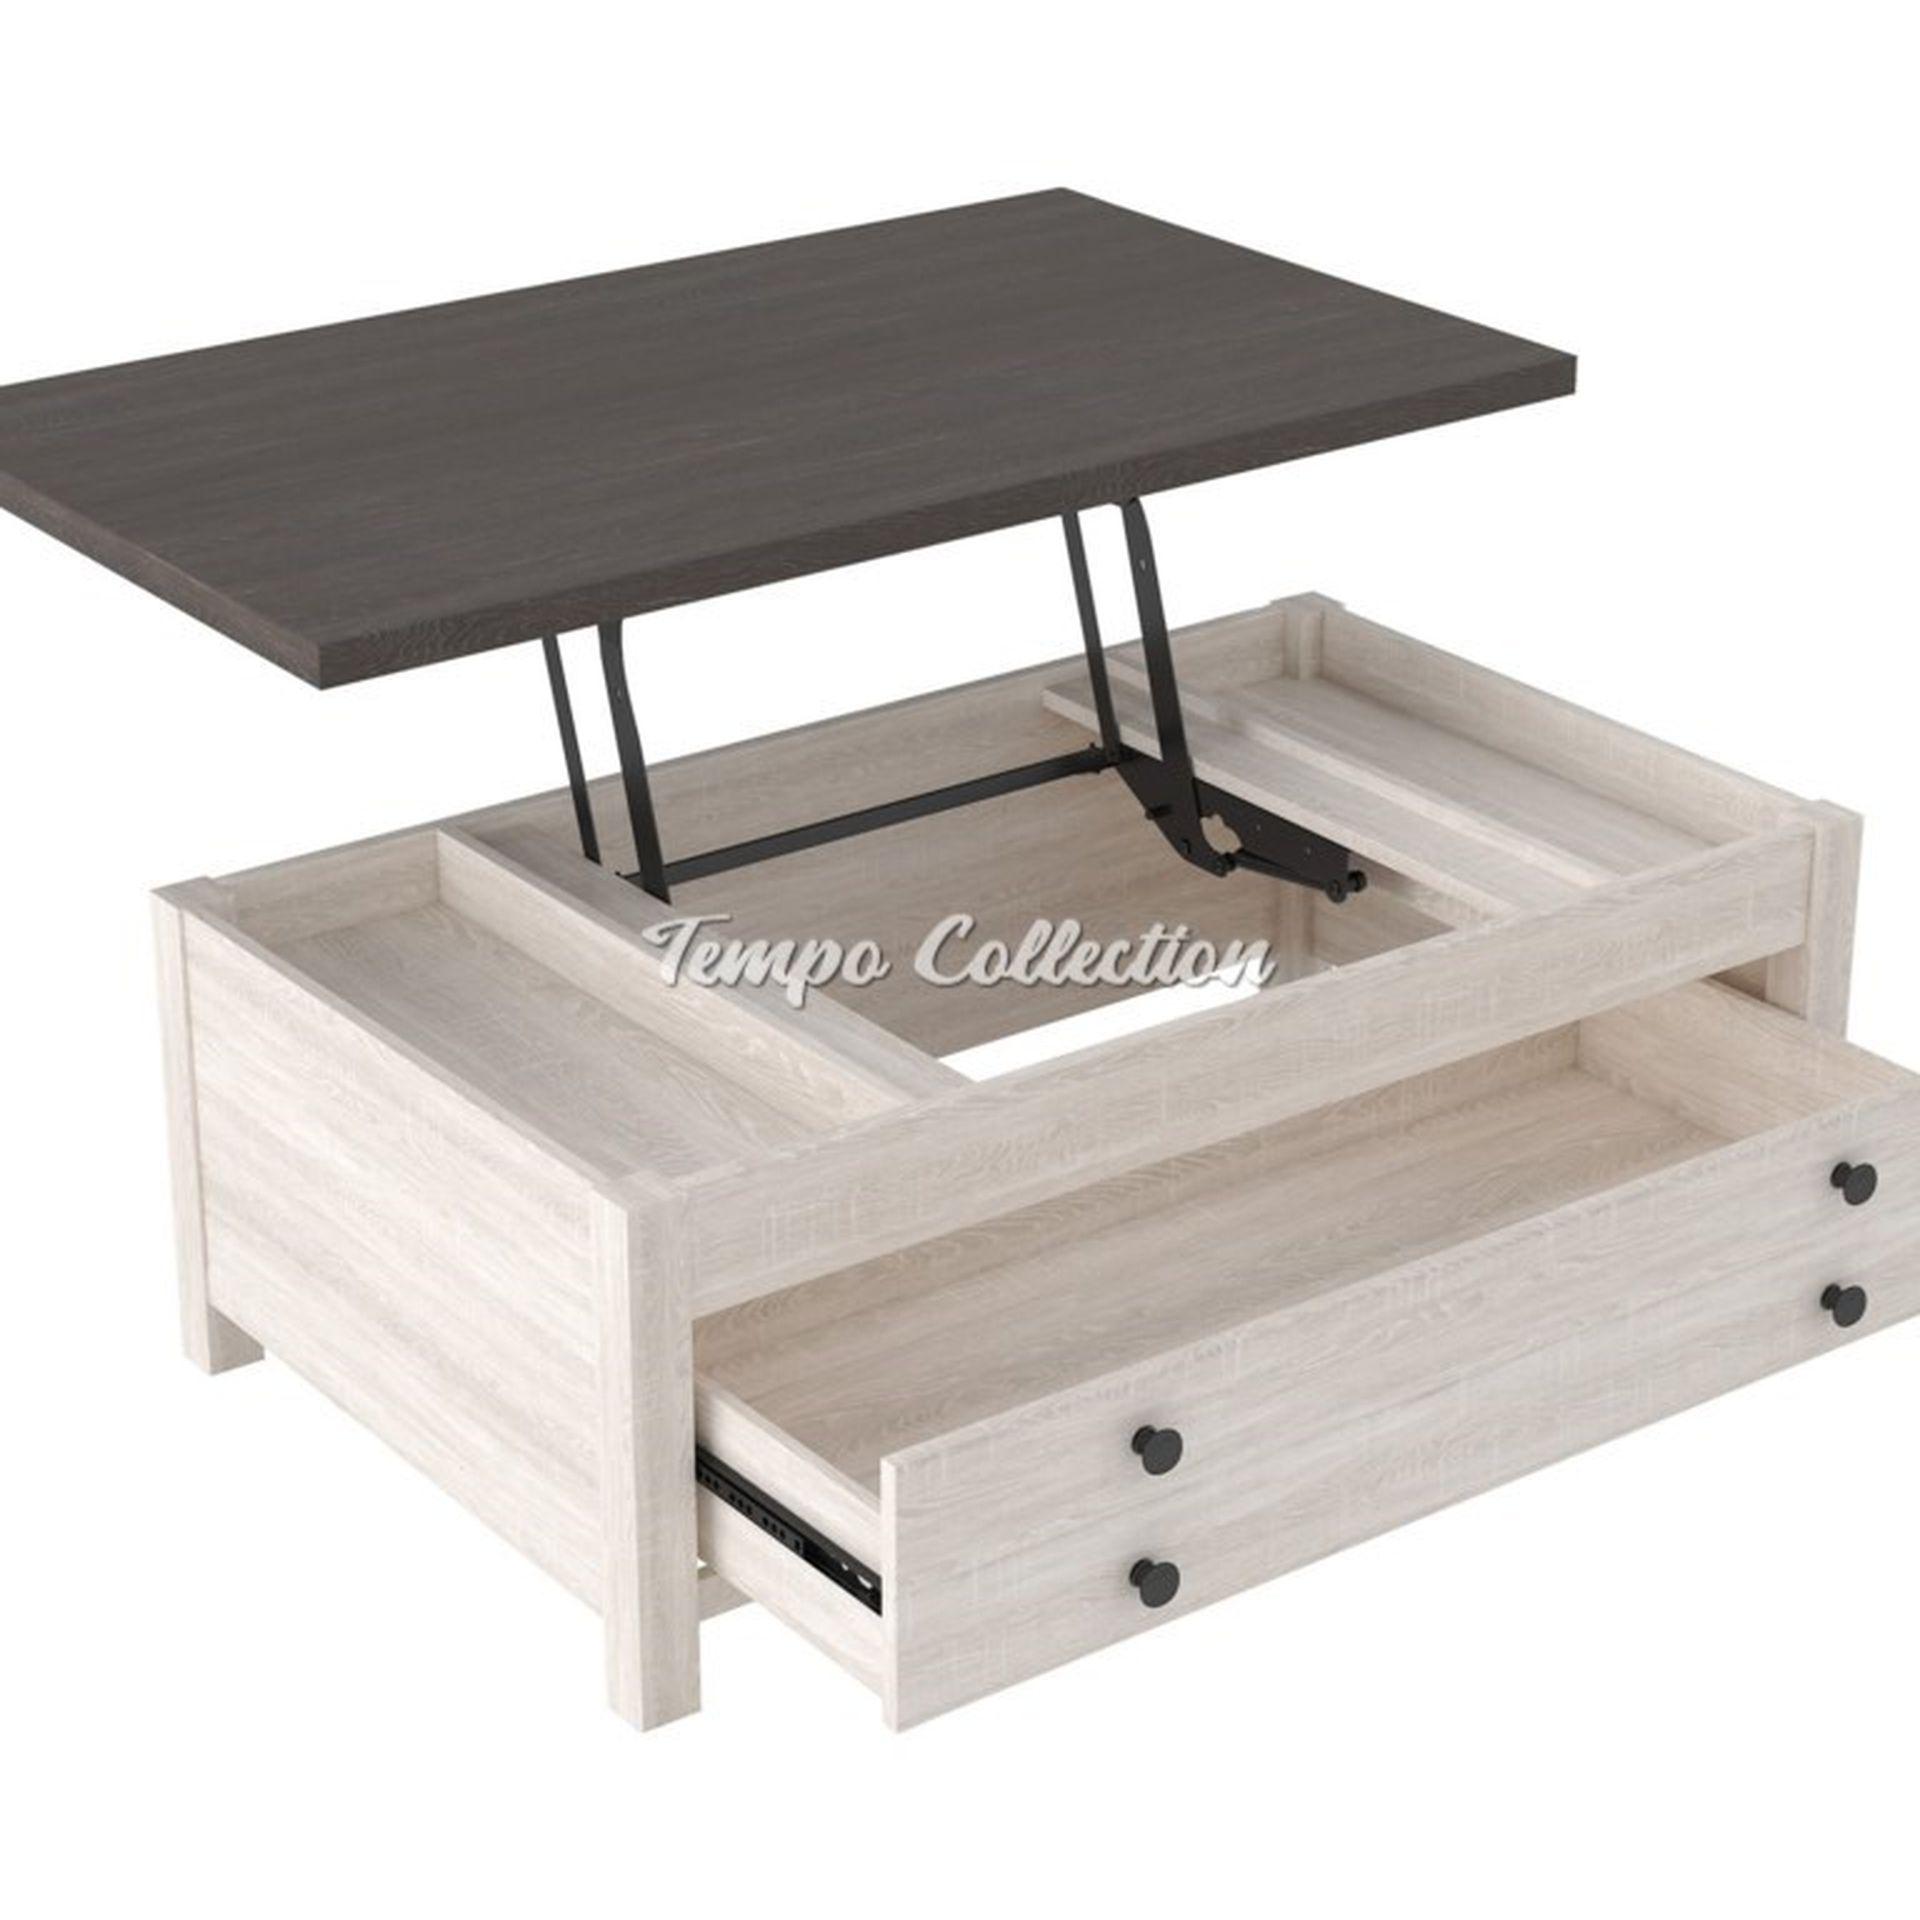 Lift-top Coffee Table, SKU# ASHT287-9TC